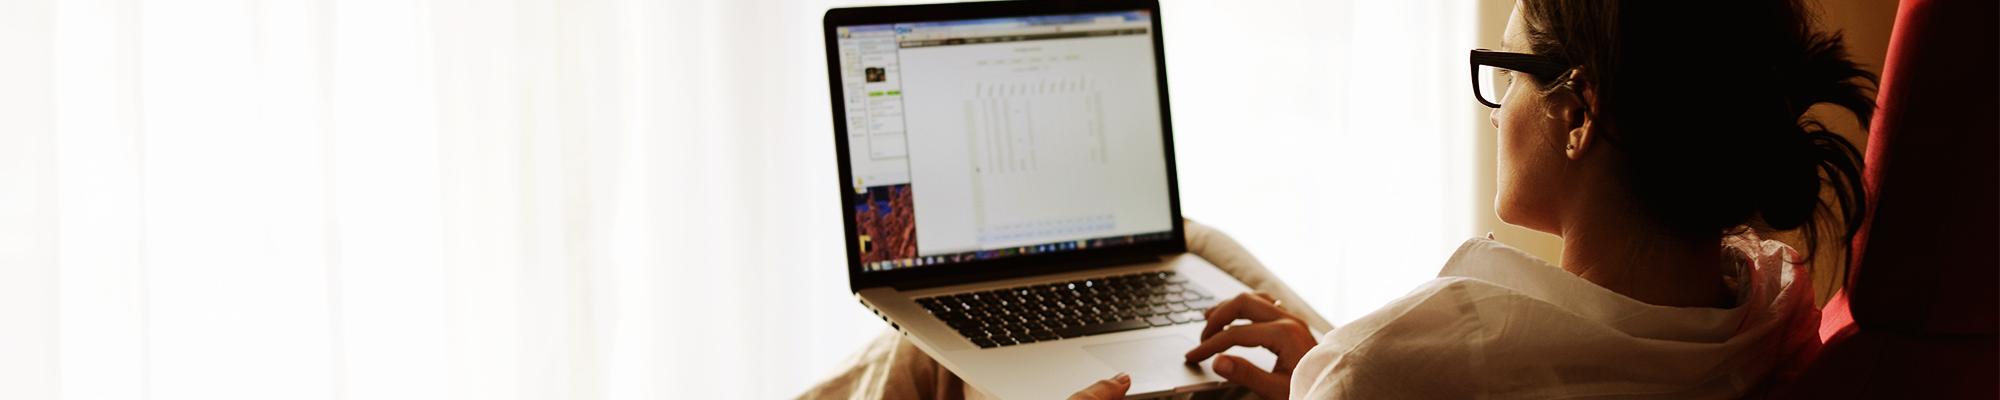 Dealing with digital burnout